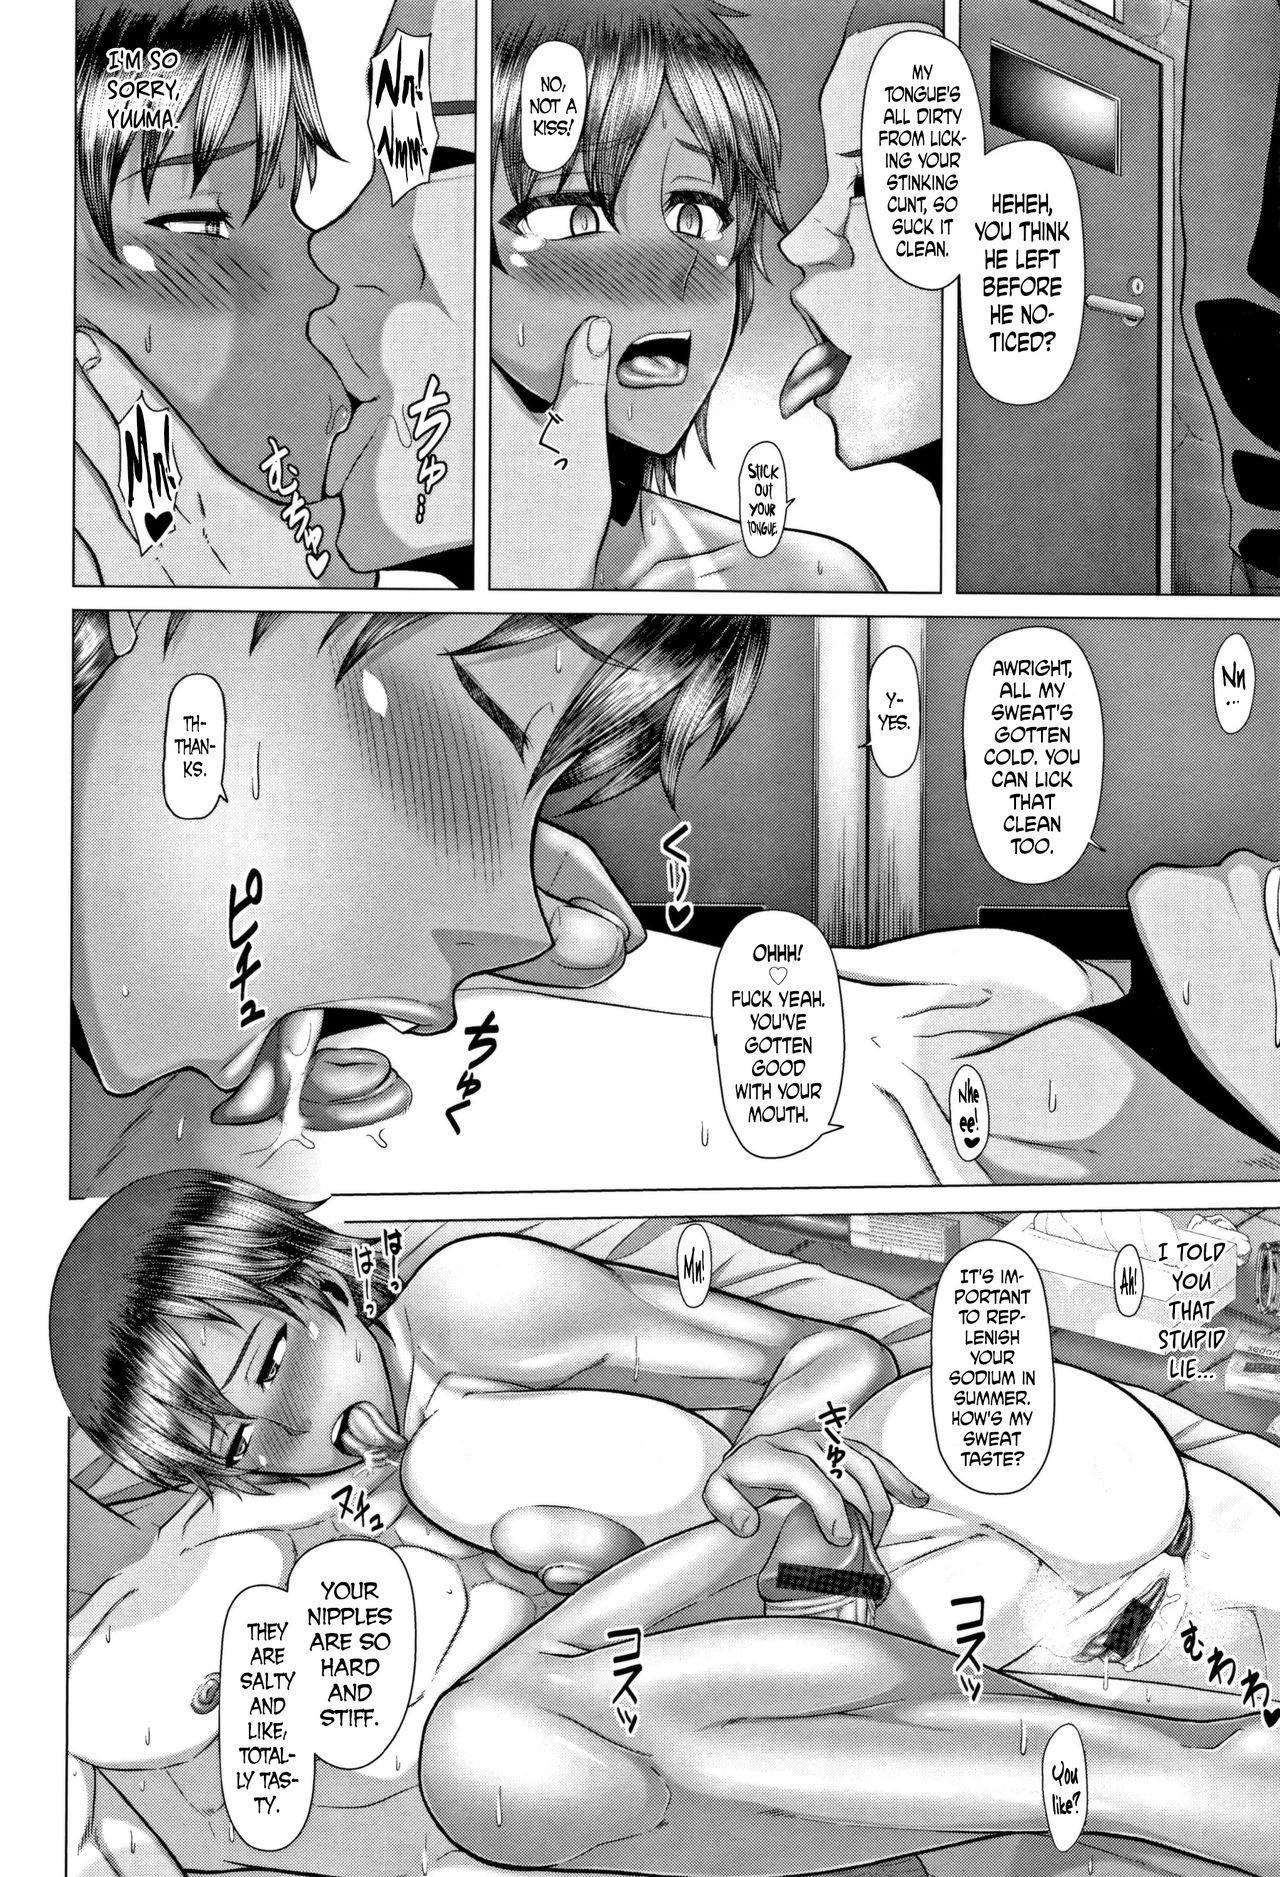 [Inoue Nanaki] Joushiki Daha! Kuro Gal Bitch-ka Seikatsu Ch. 1-3, 5-8 [English] [Dark Mac + N04h] 31